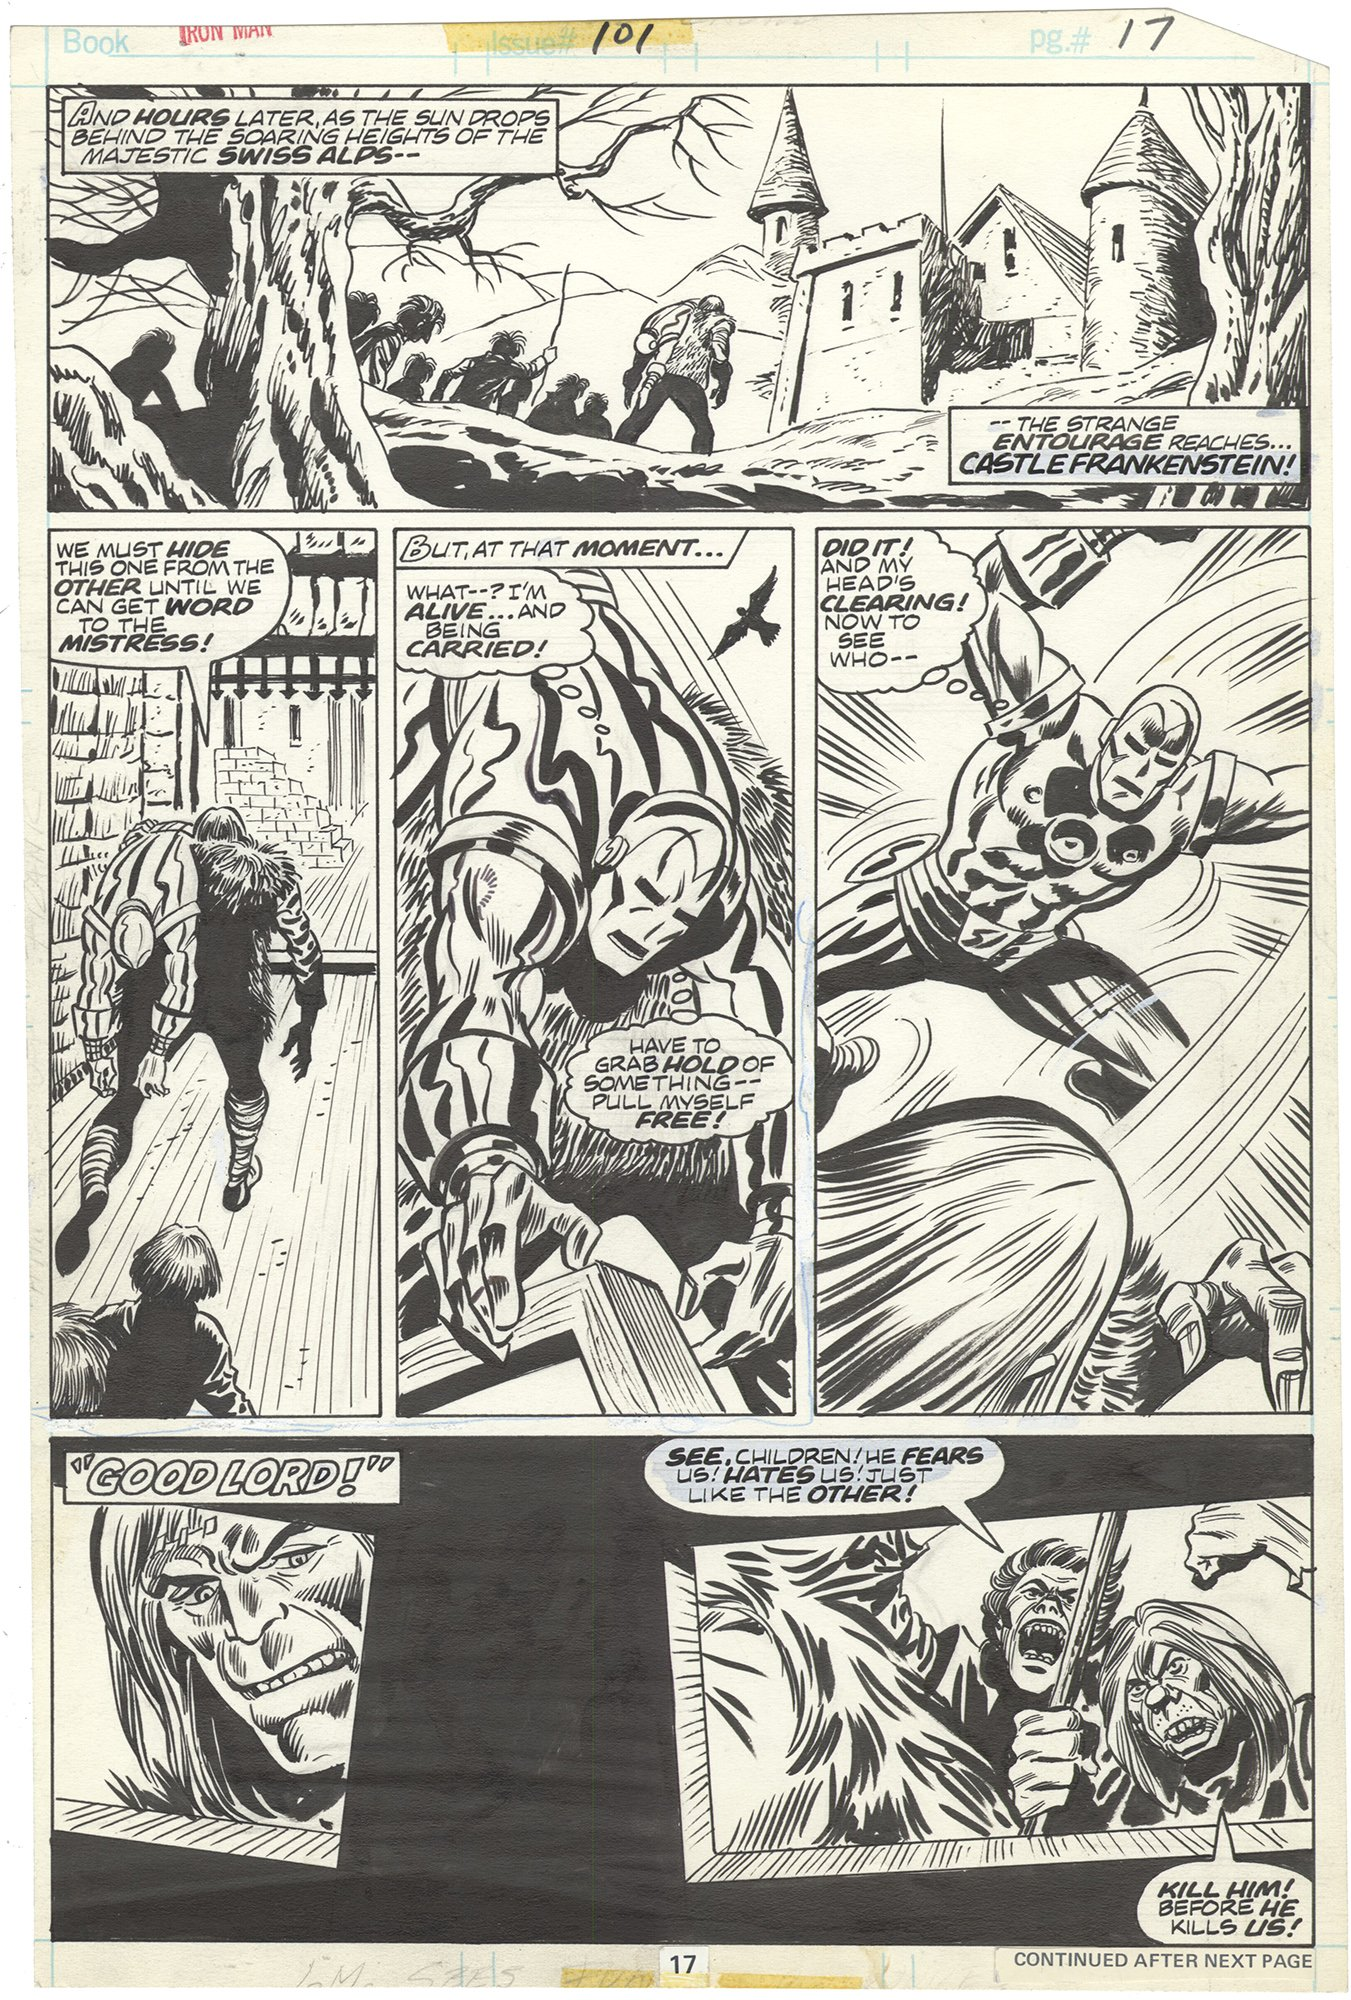 Iron Man #101 p17